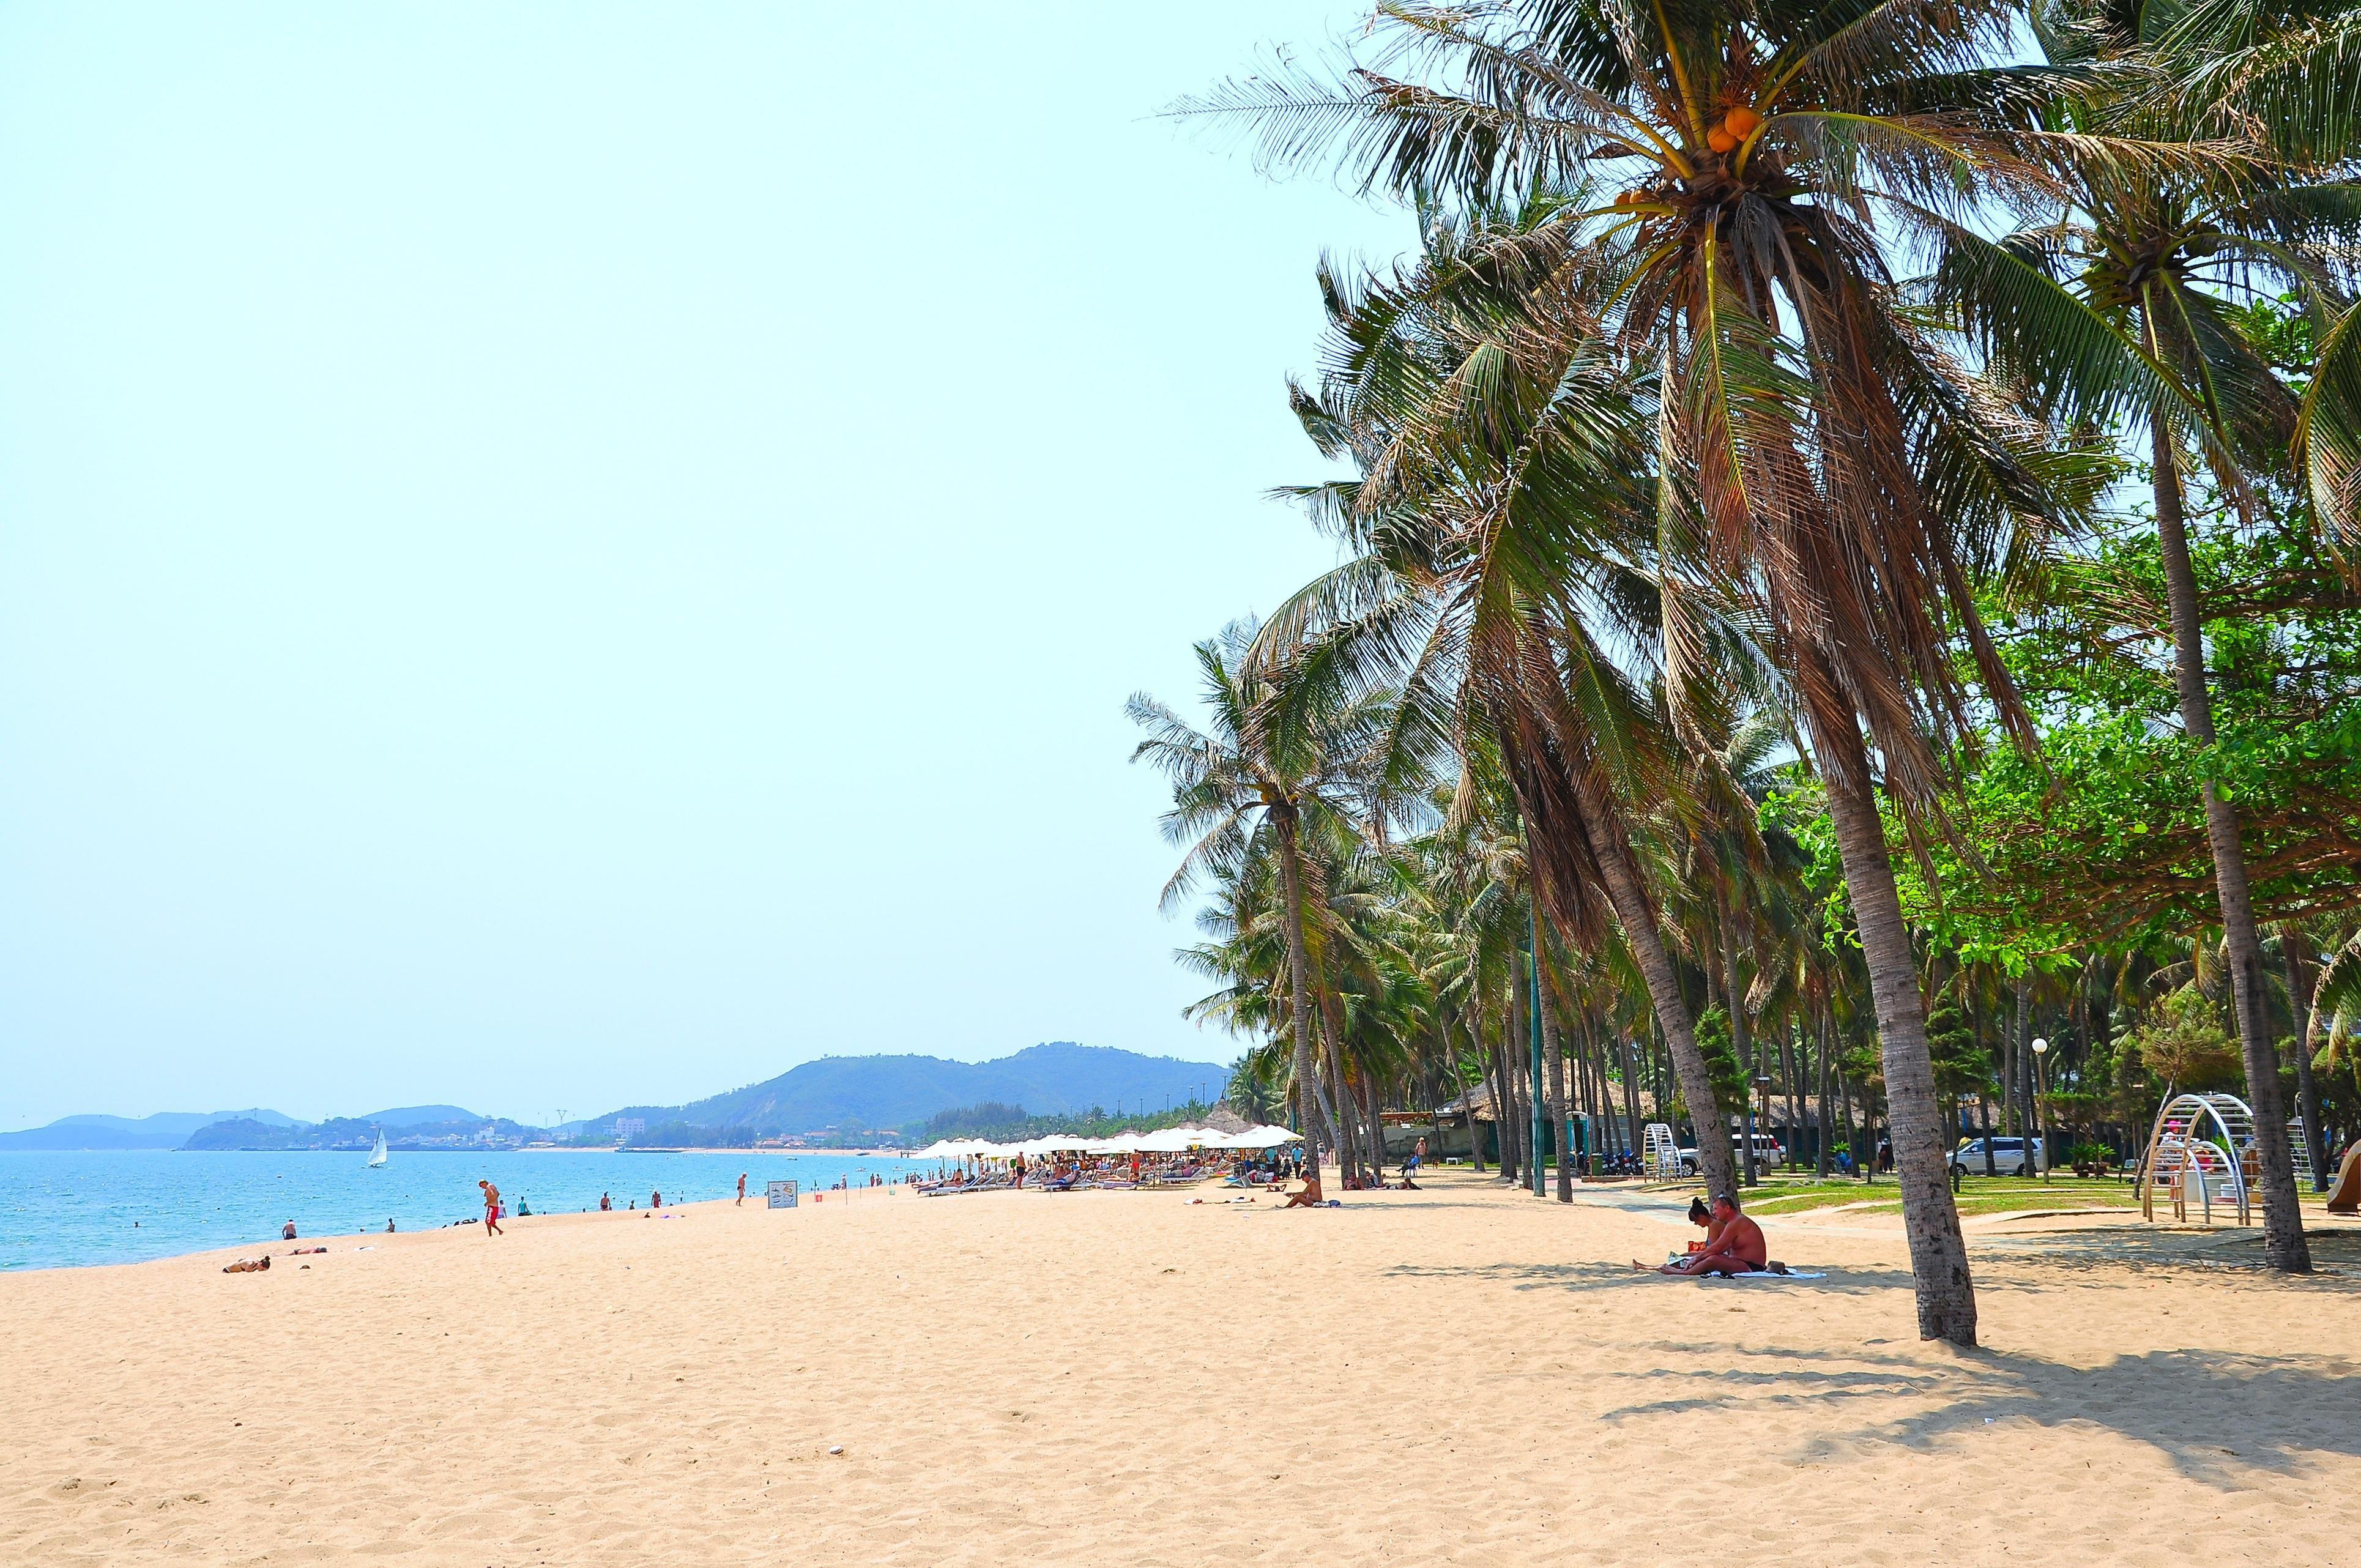 Top Beaches in Nha Trang